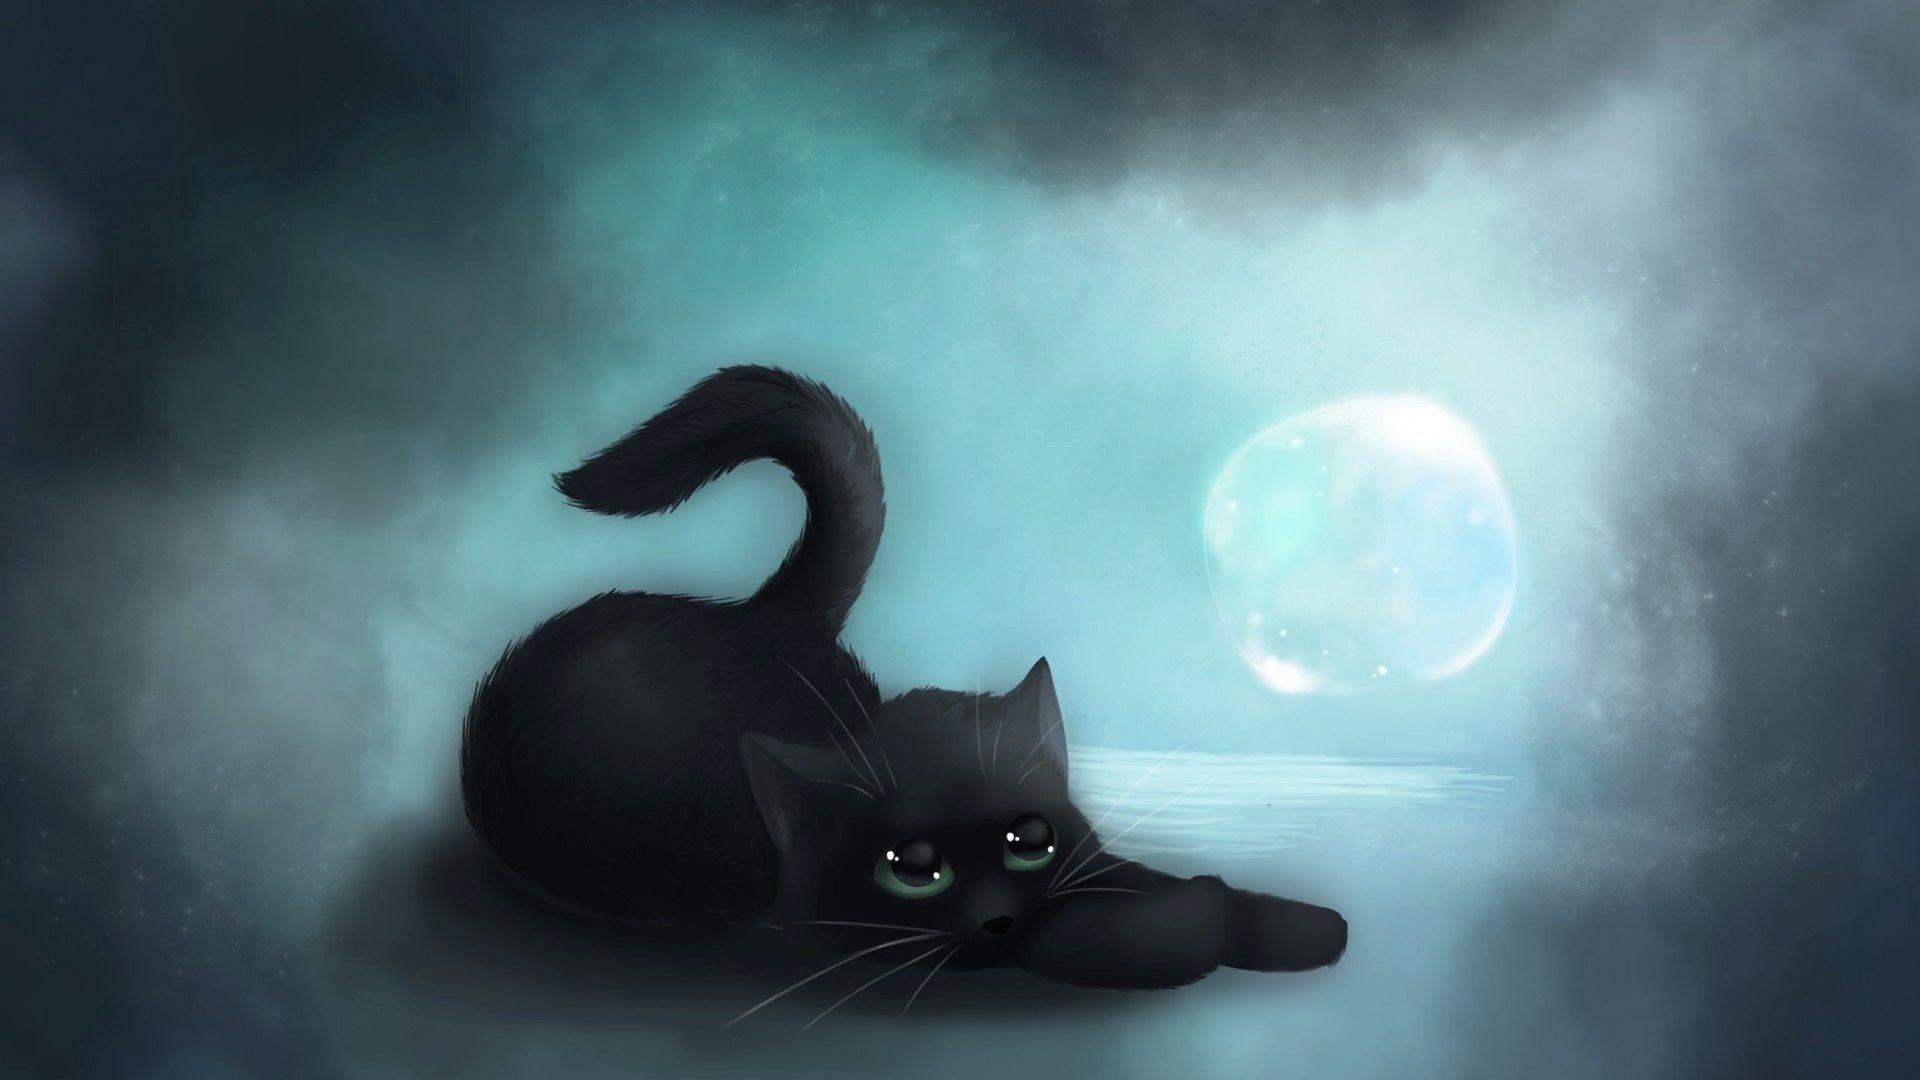 Drawn Cats Image